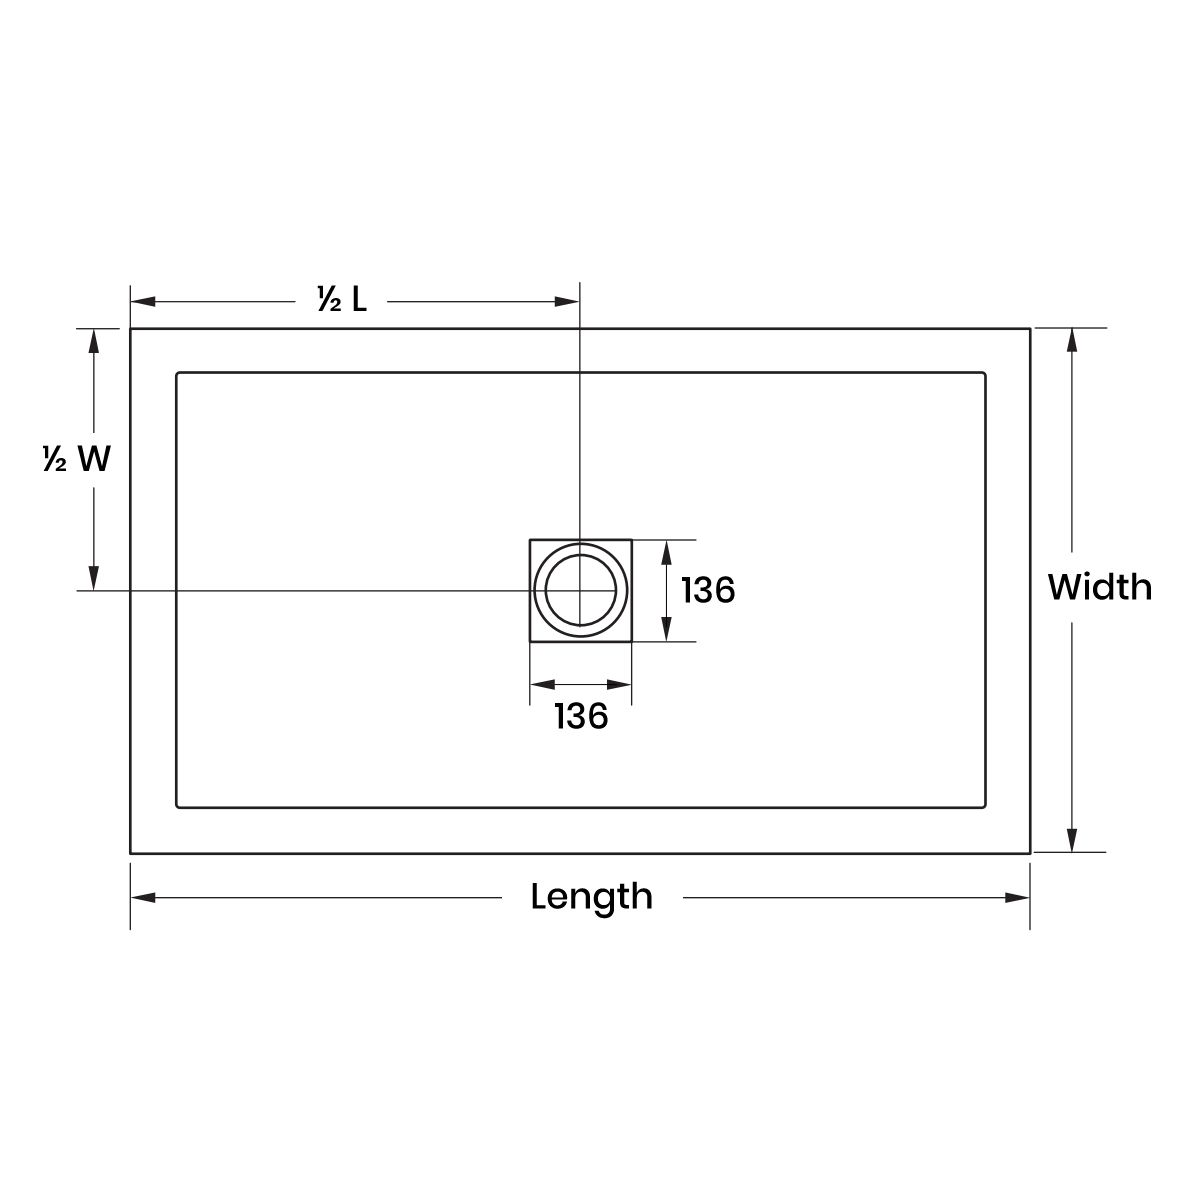 Aquadart Black Slate Shower Tray 1700 x 760 Dimension